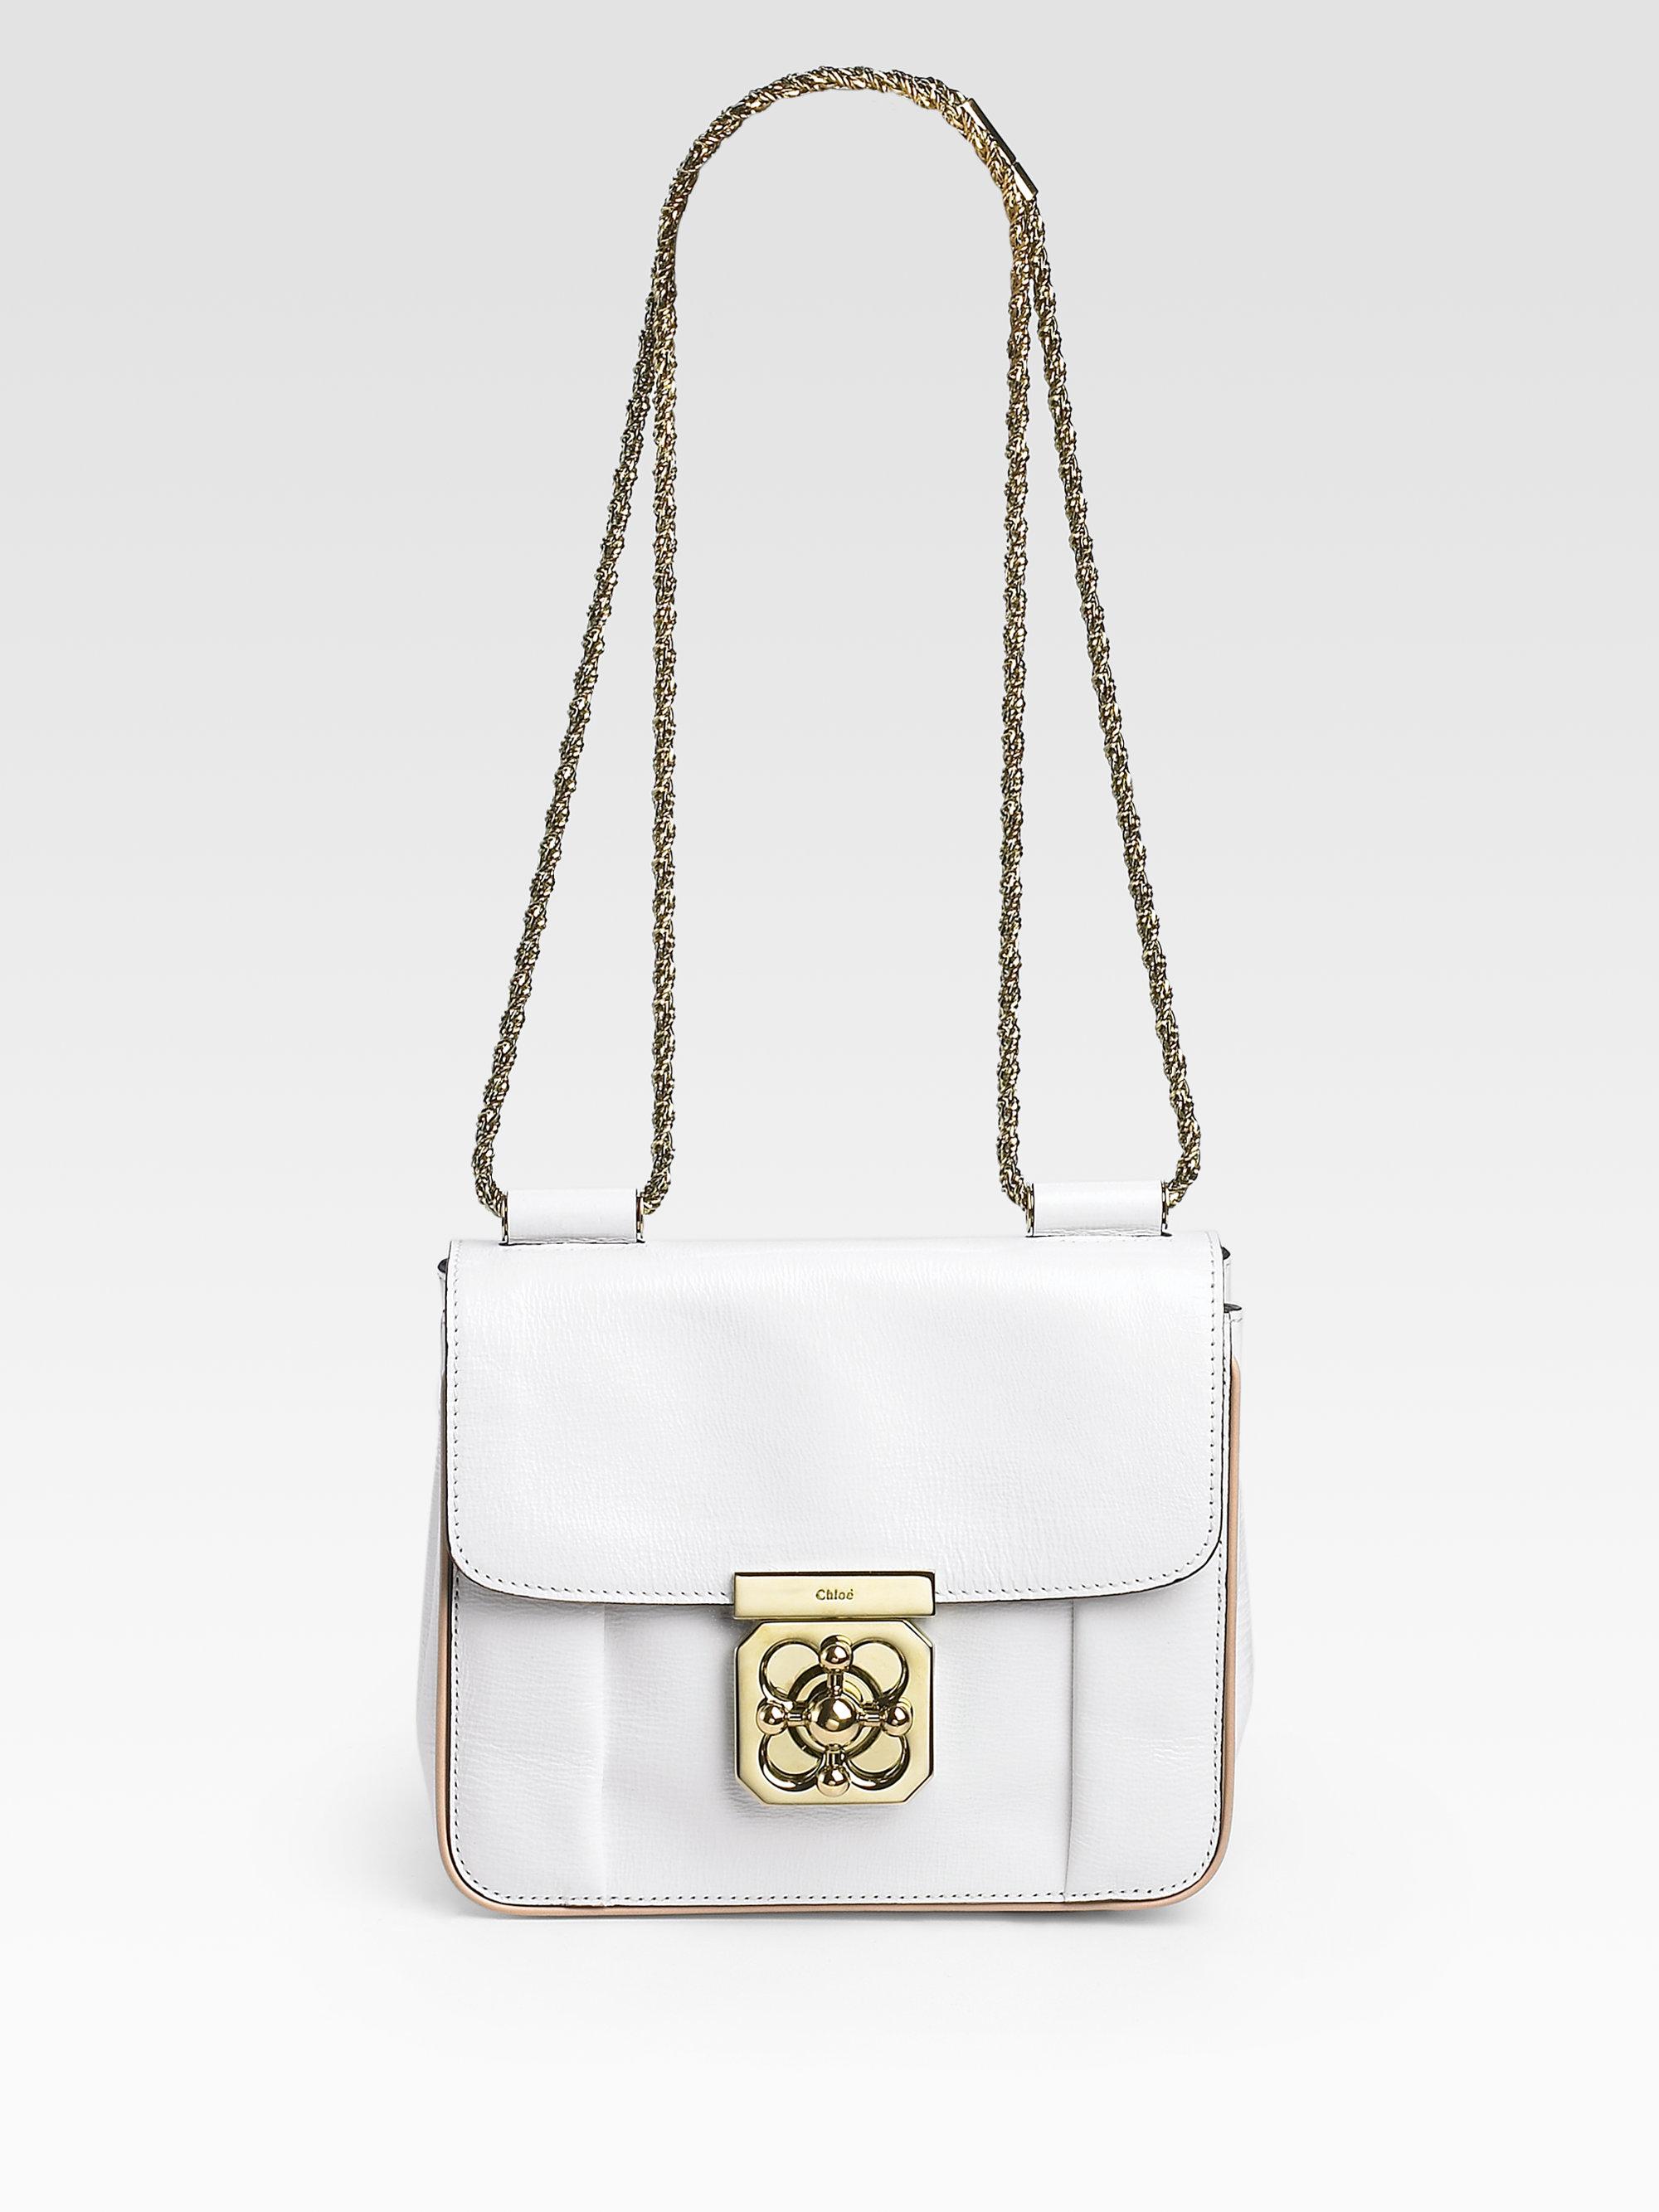 chloe knockoff handbags 2013